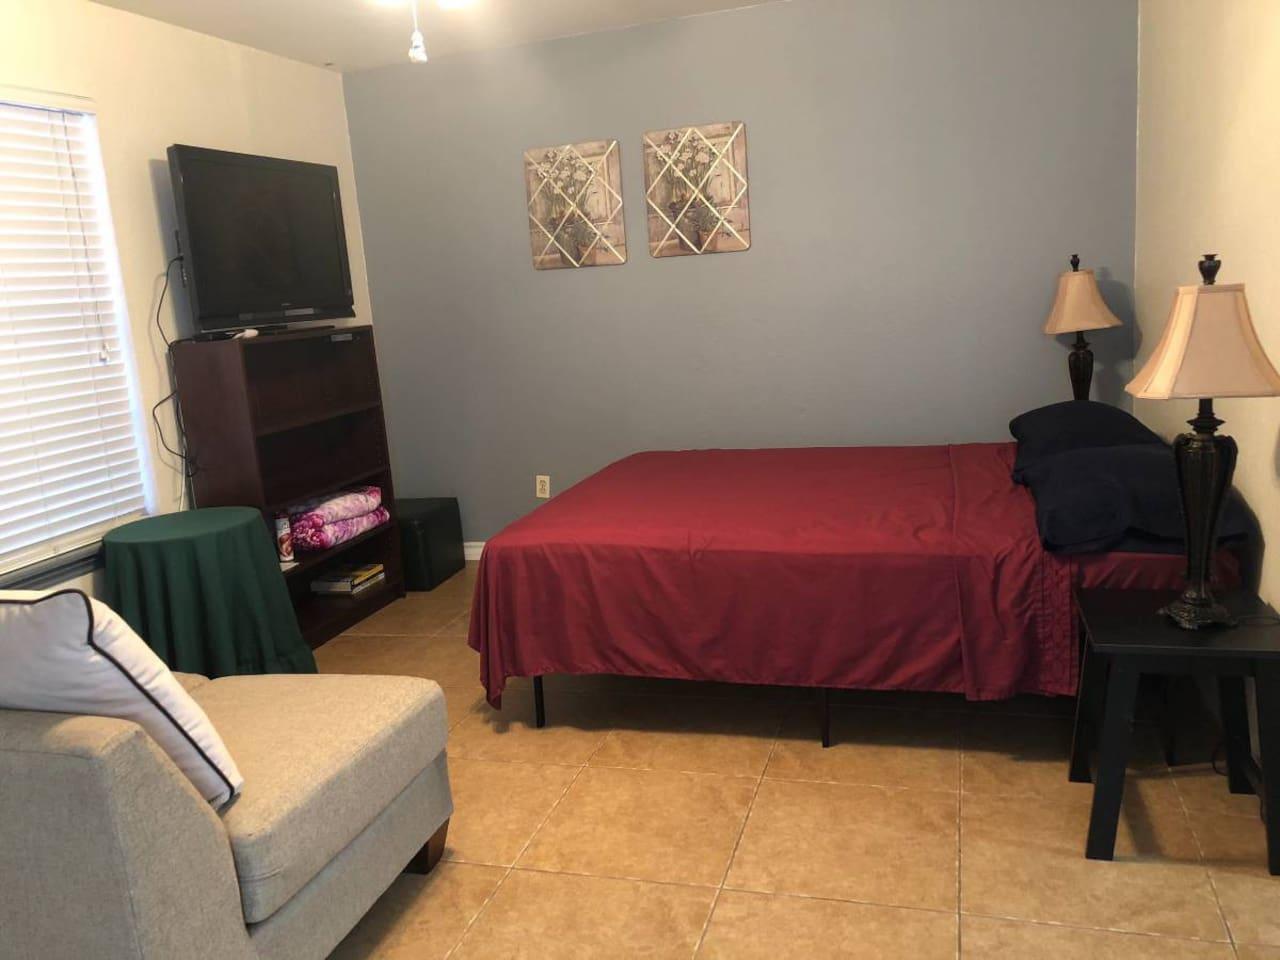 Queen size bed, 40 inch TV, sofa loveseat.